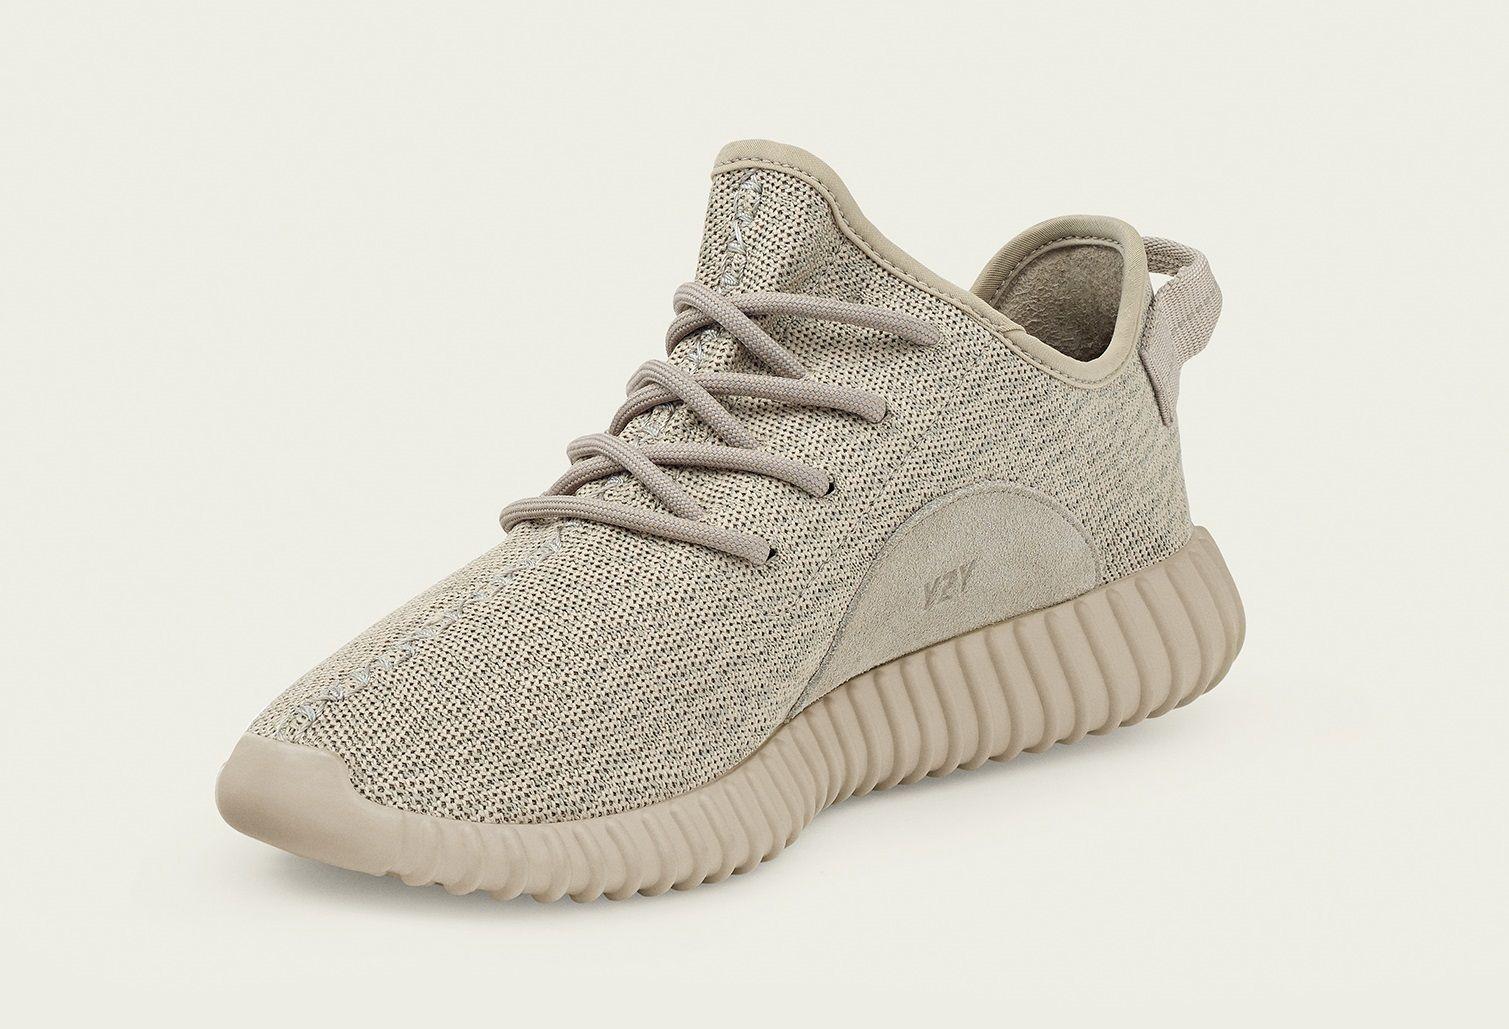 zapatilla adidas yeezy